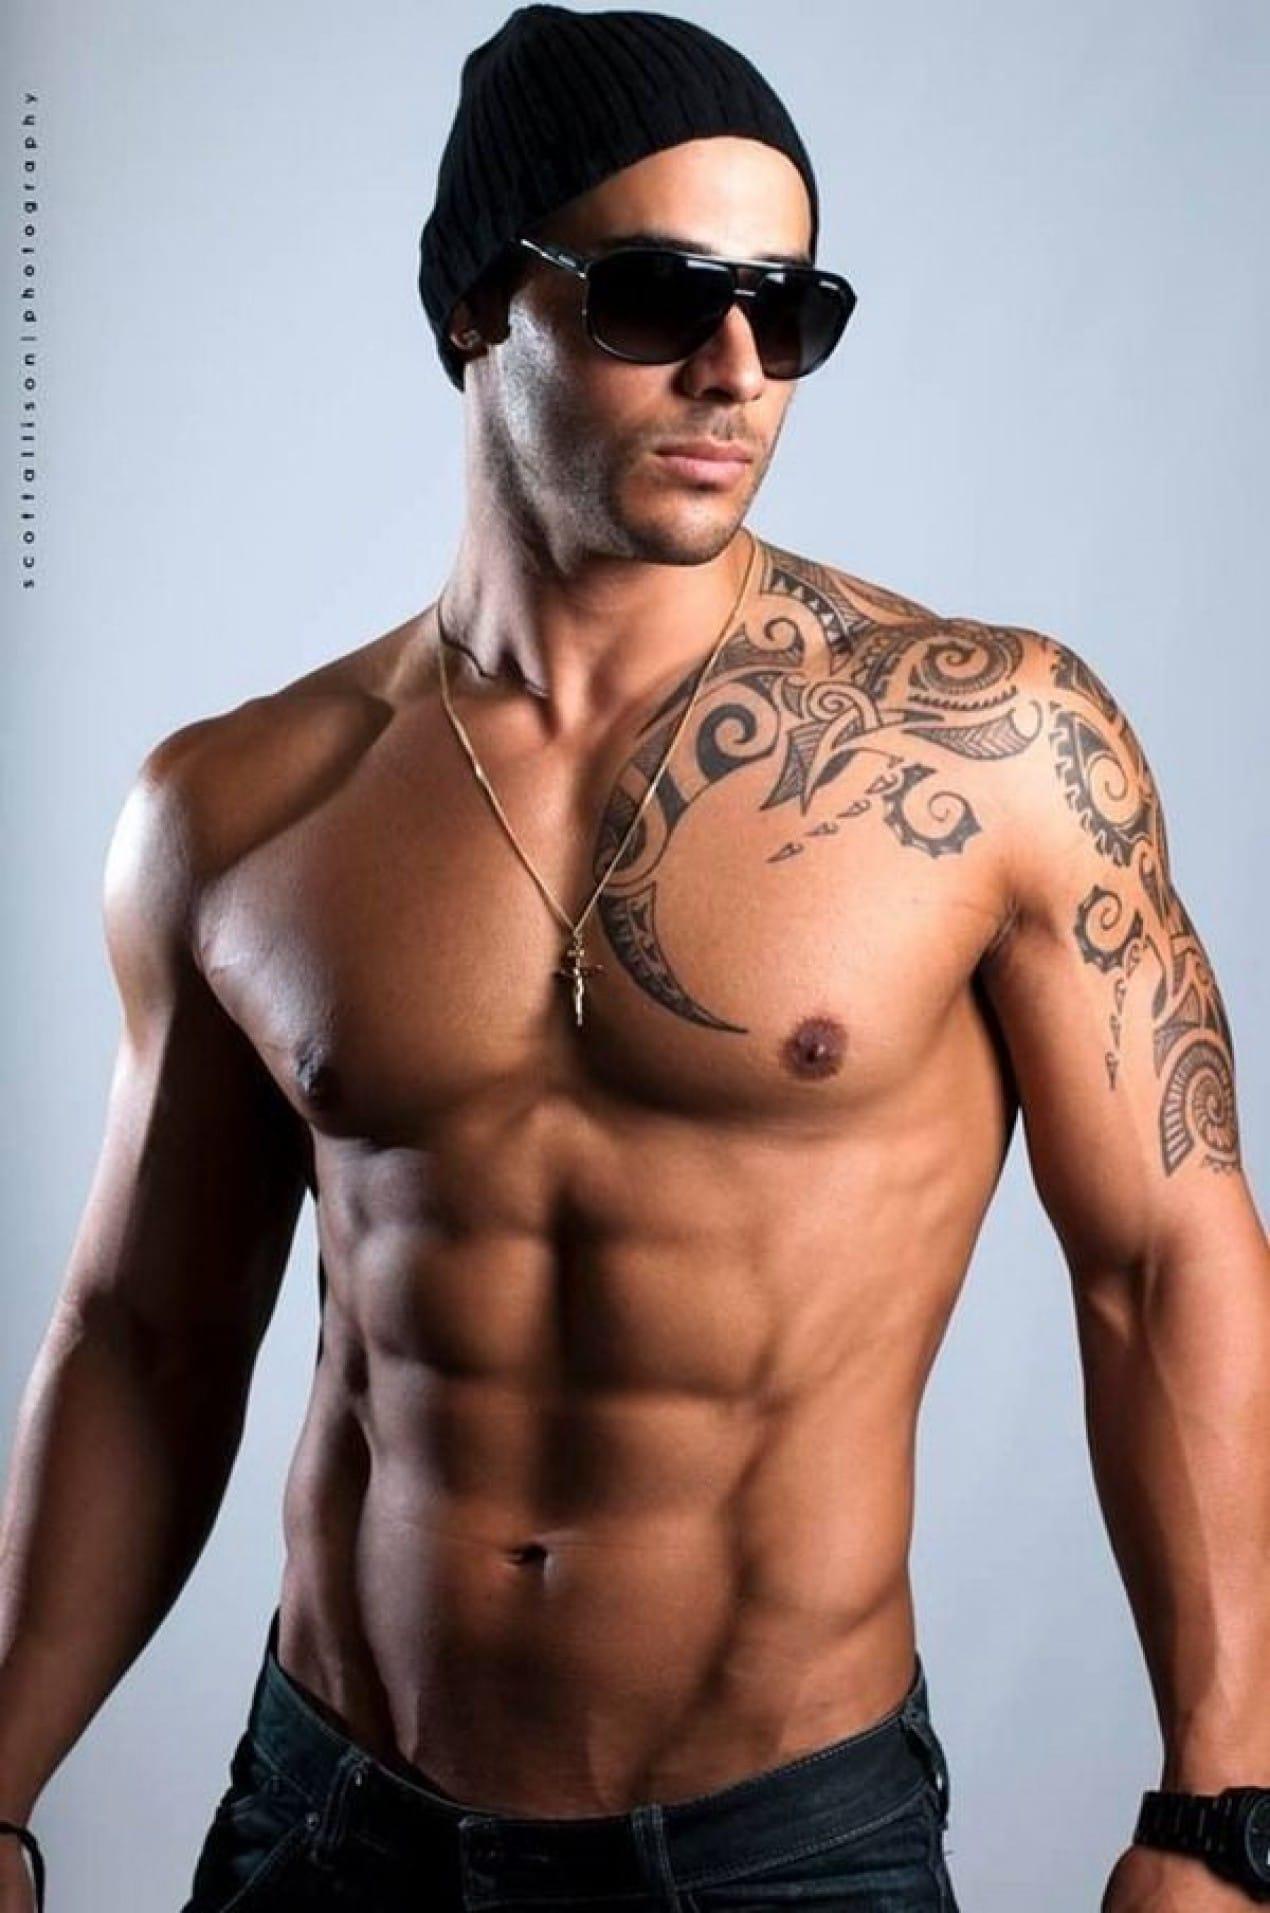 Ordinaire Idee Tatouage Homme Discret 11 Homme Bras Tribal